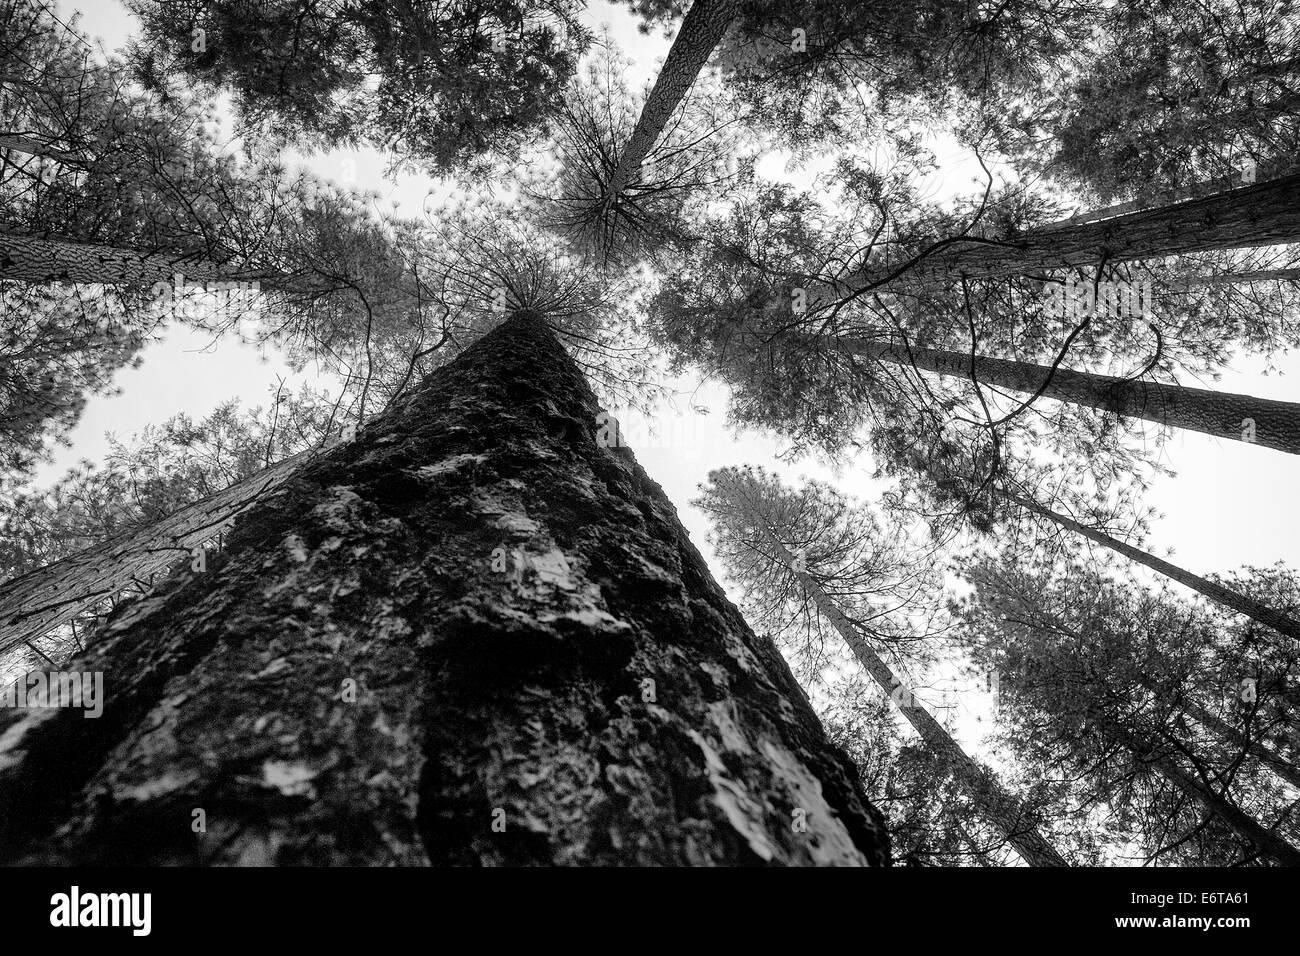 Pines of Yosemite National Park, Pinus sp., California, USA - Stock Image